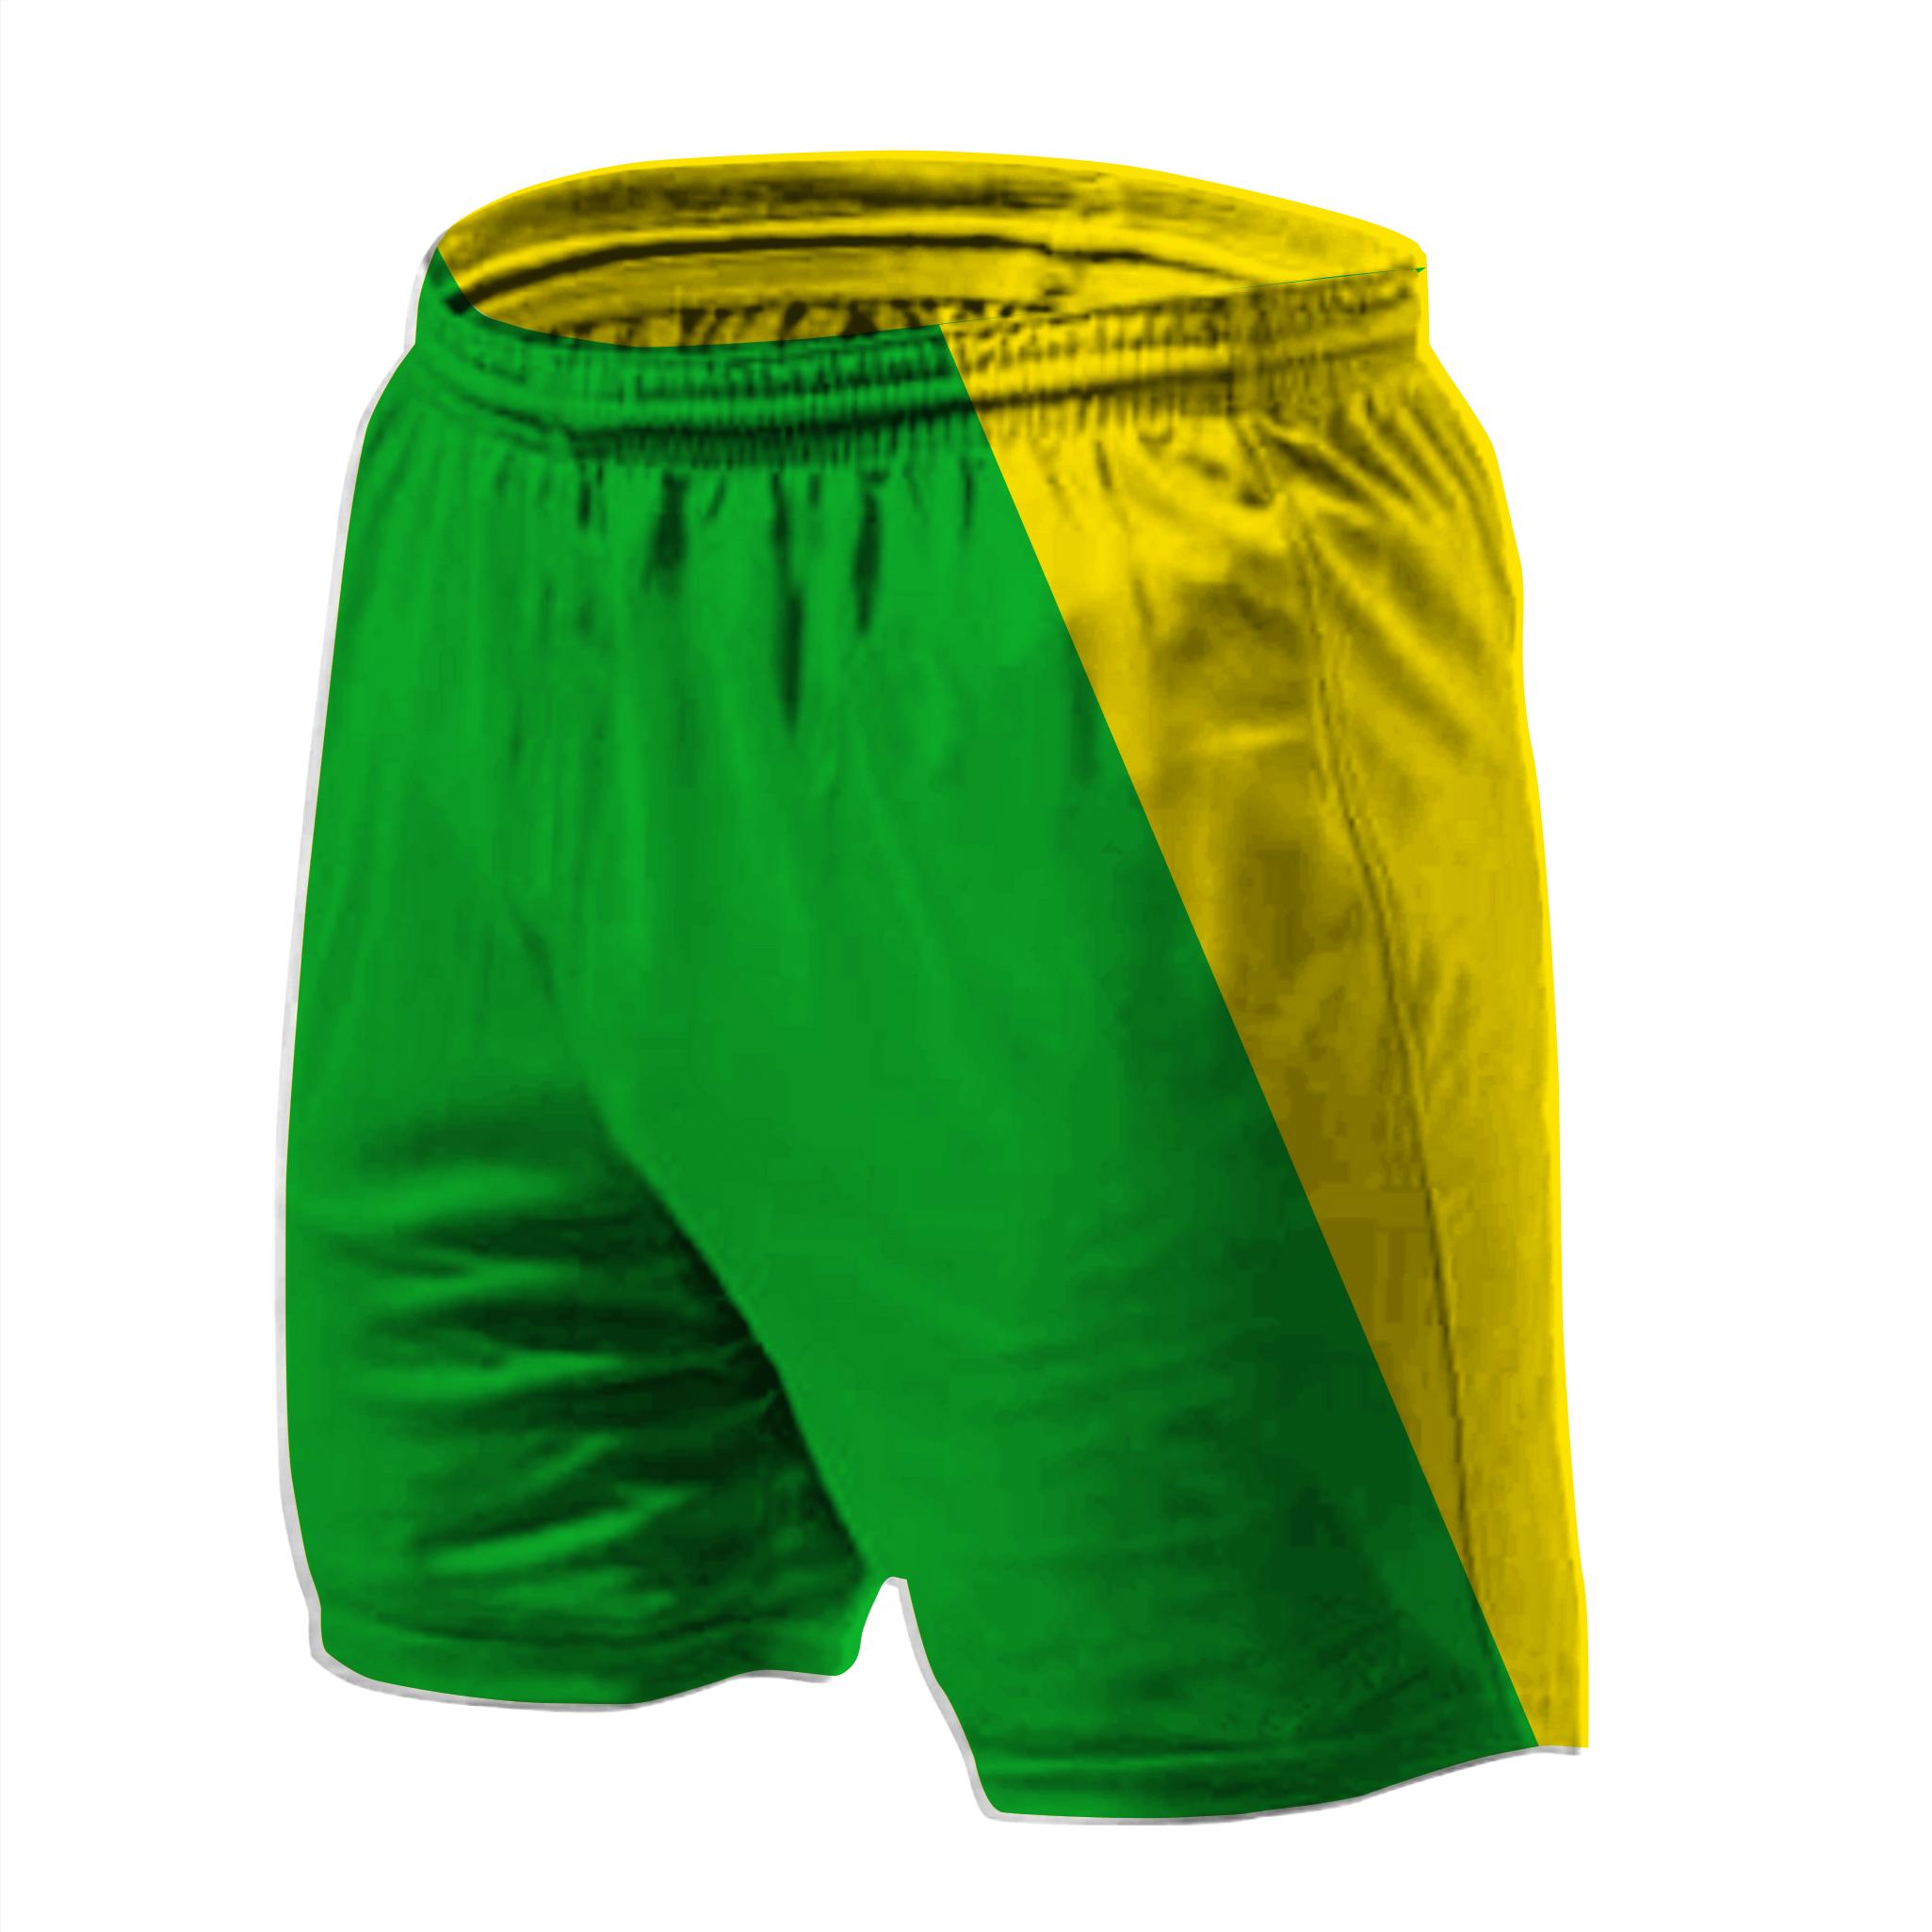 Panelled - shorts - Austin